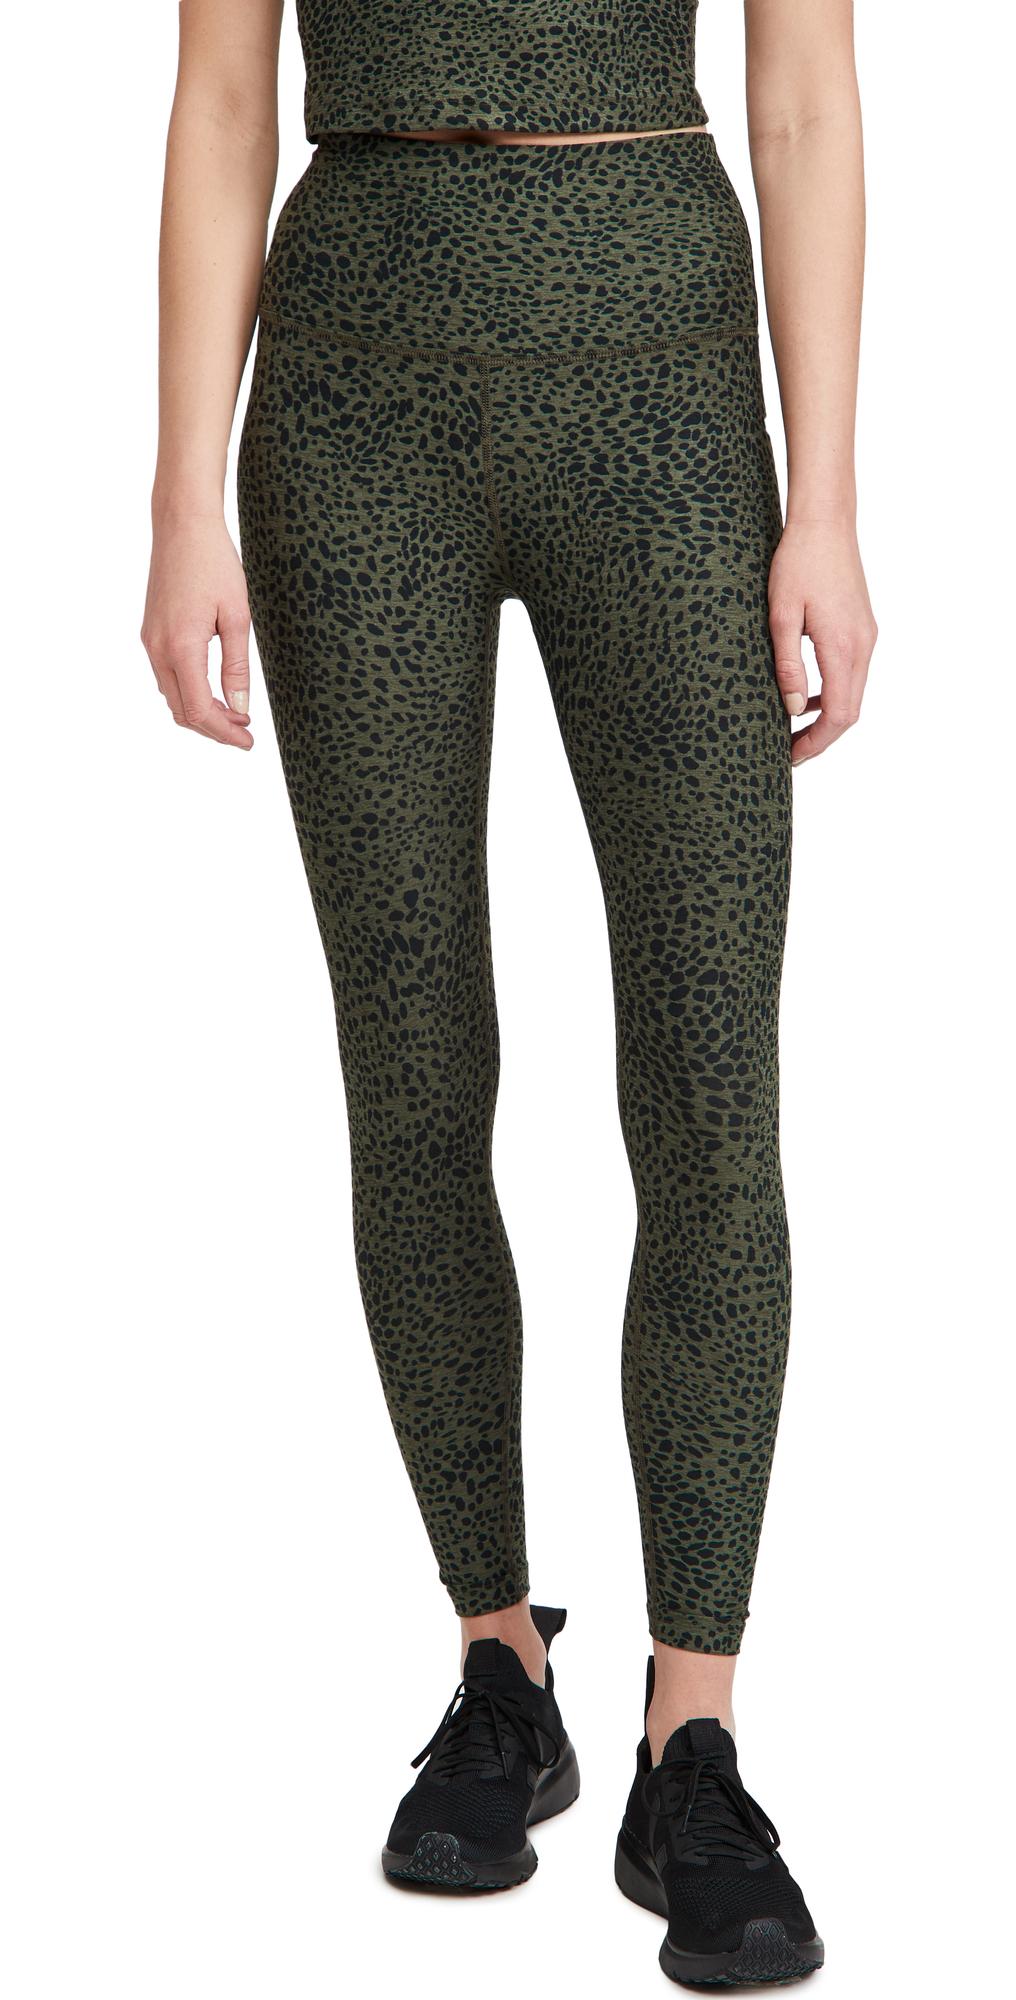 Beyond Yoga Space Dye Printed Caught In The Midi Leggings In Eden Green Cheetah